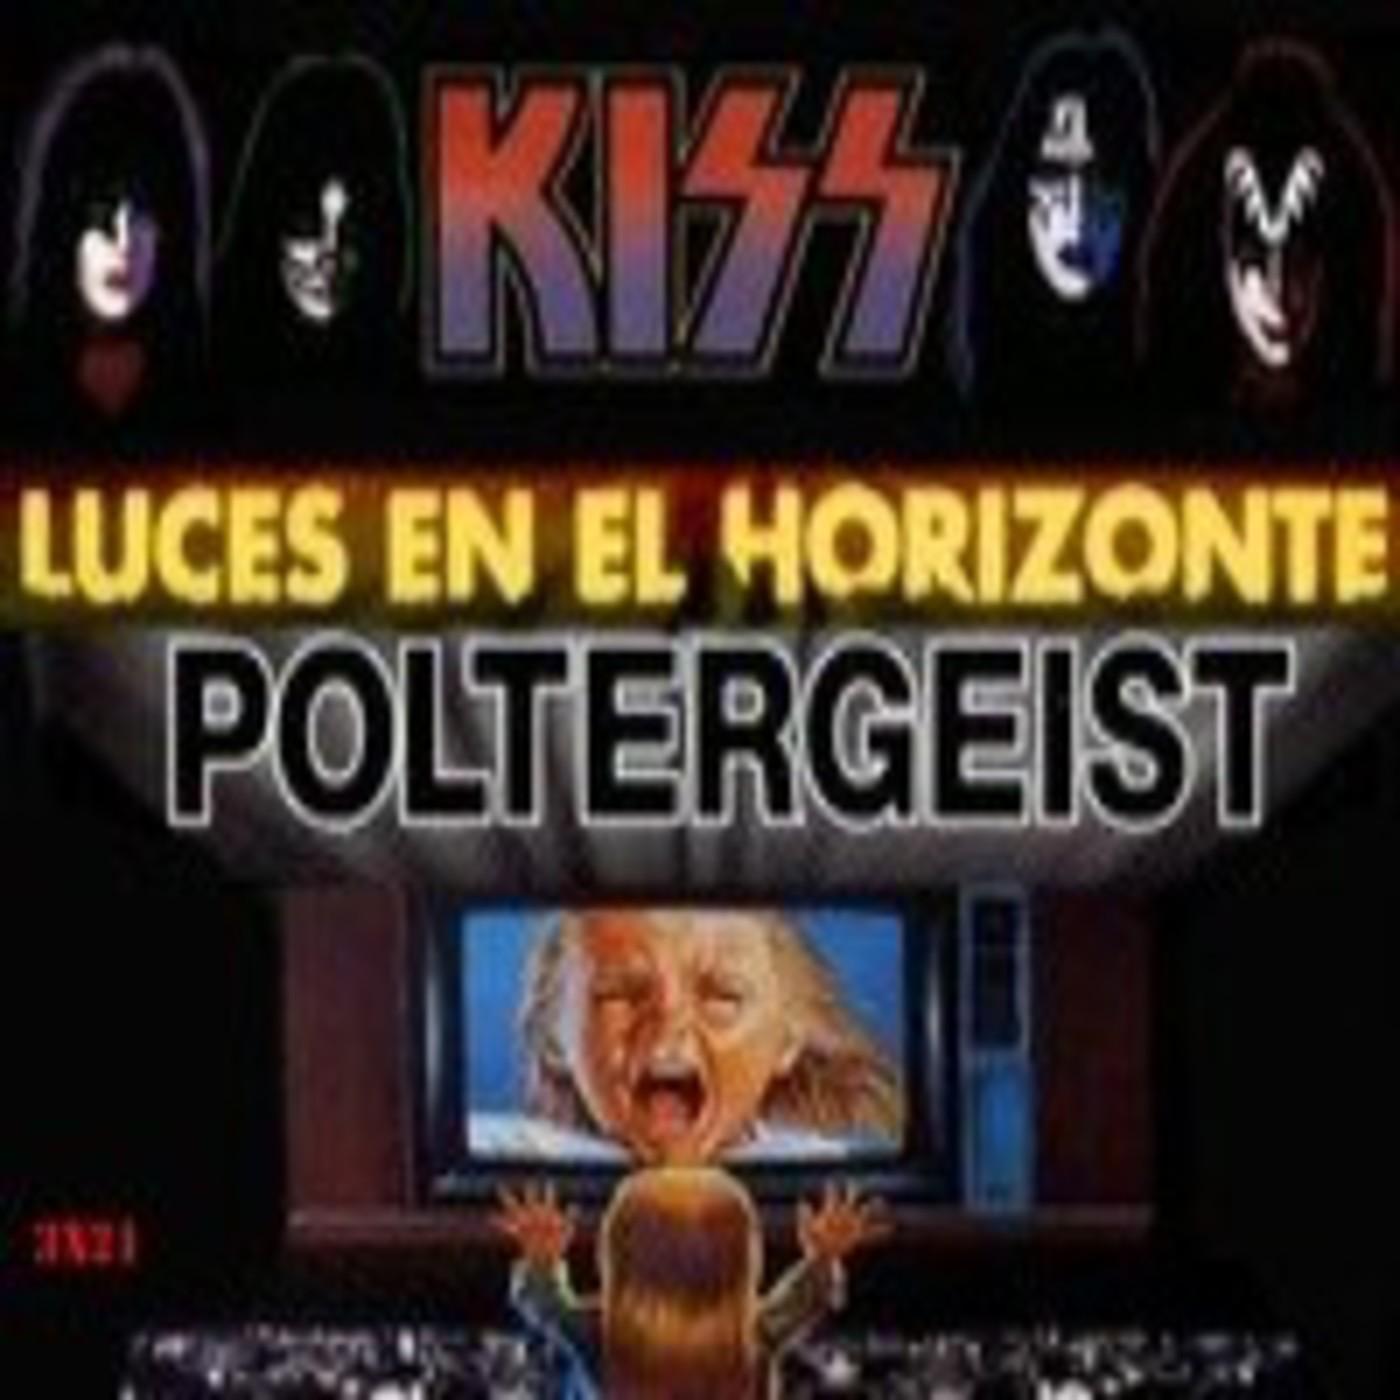 Luces en el Horizonte 3X21: POLTERGEIST - KISS